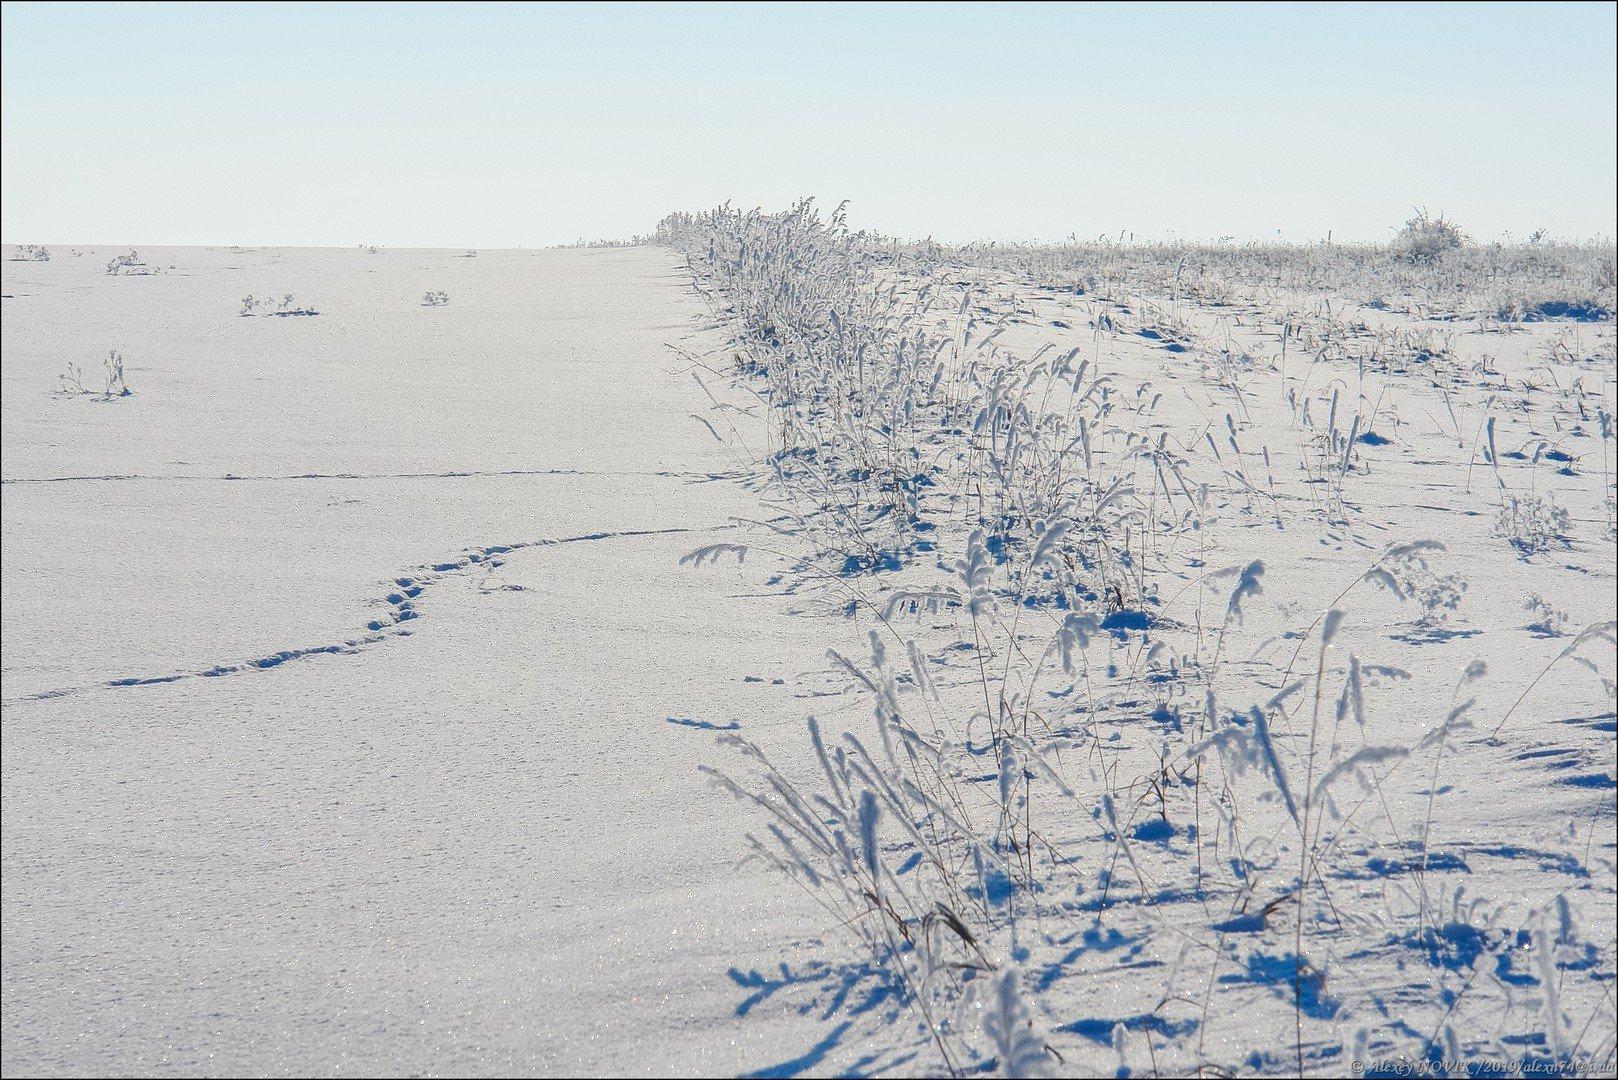 зима снежная целина фото каждом доме